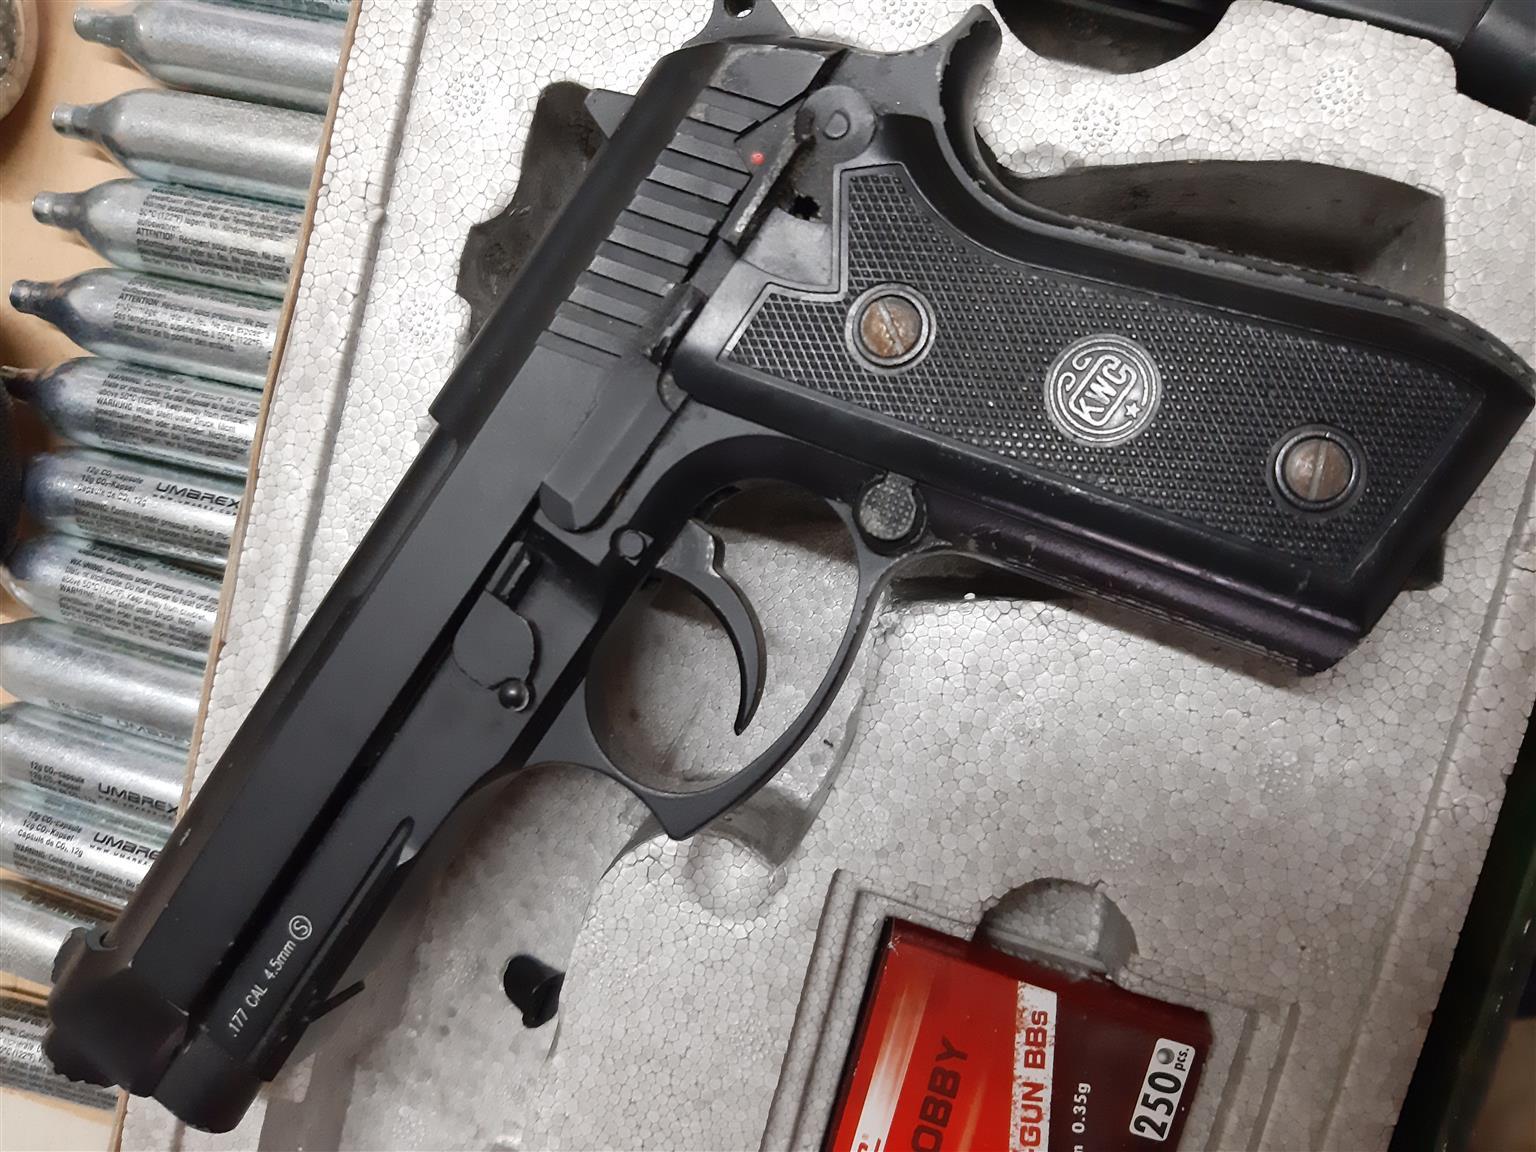 Co2 KWC blowback toy airgun